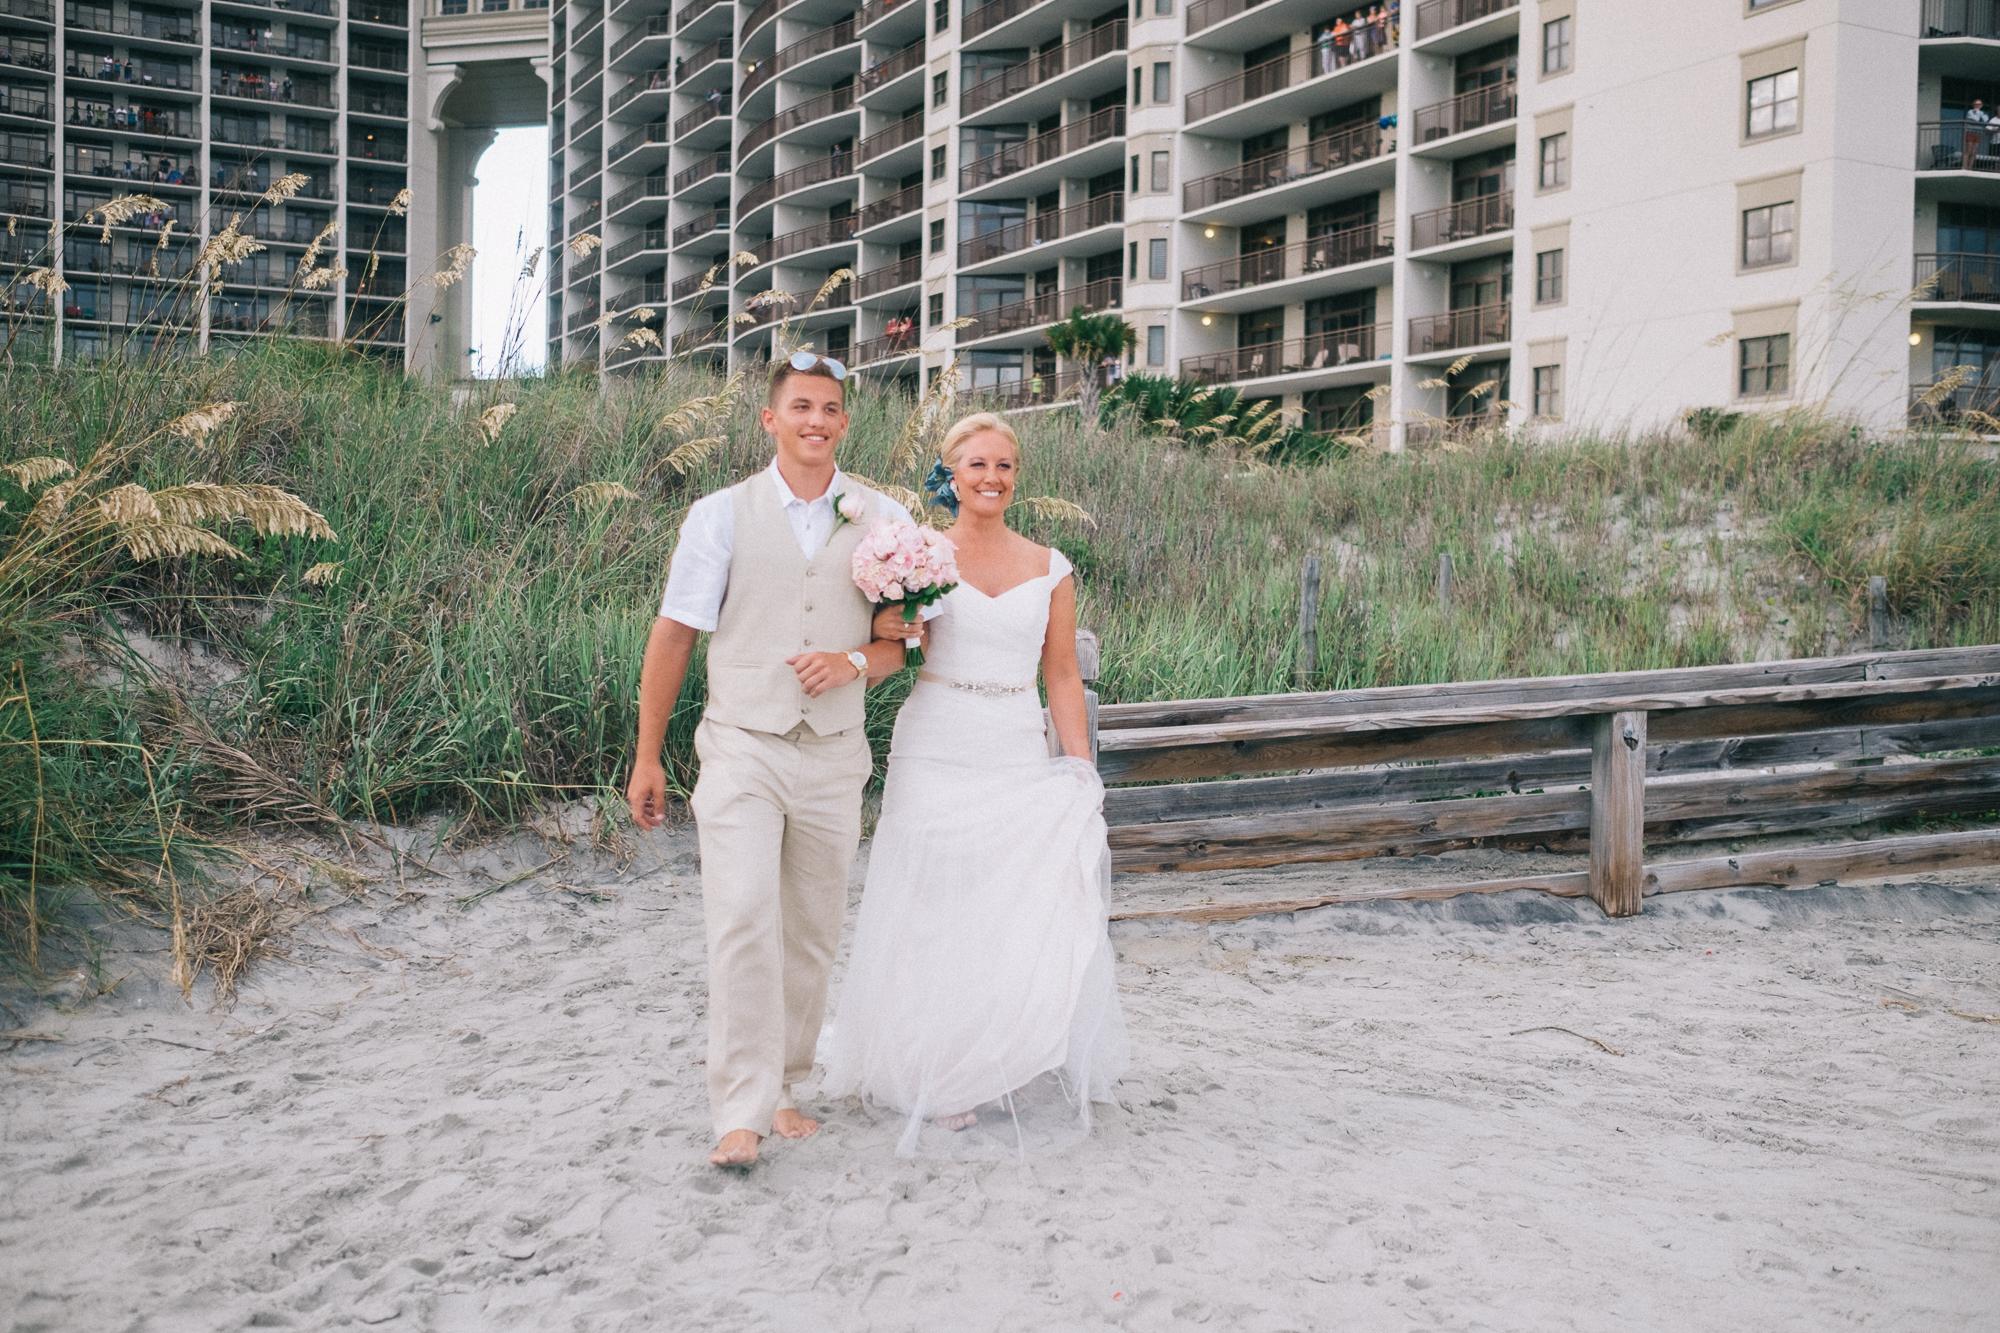 Stephanie-Mike-wedding-blog-10.jpg